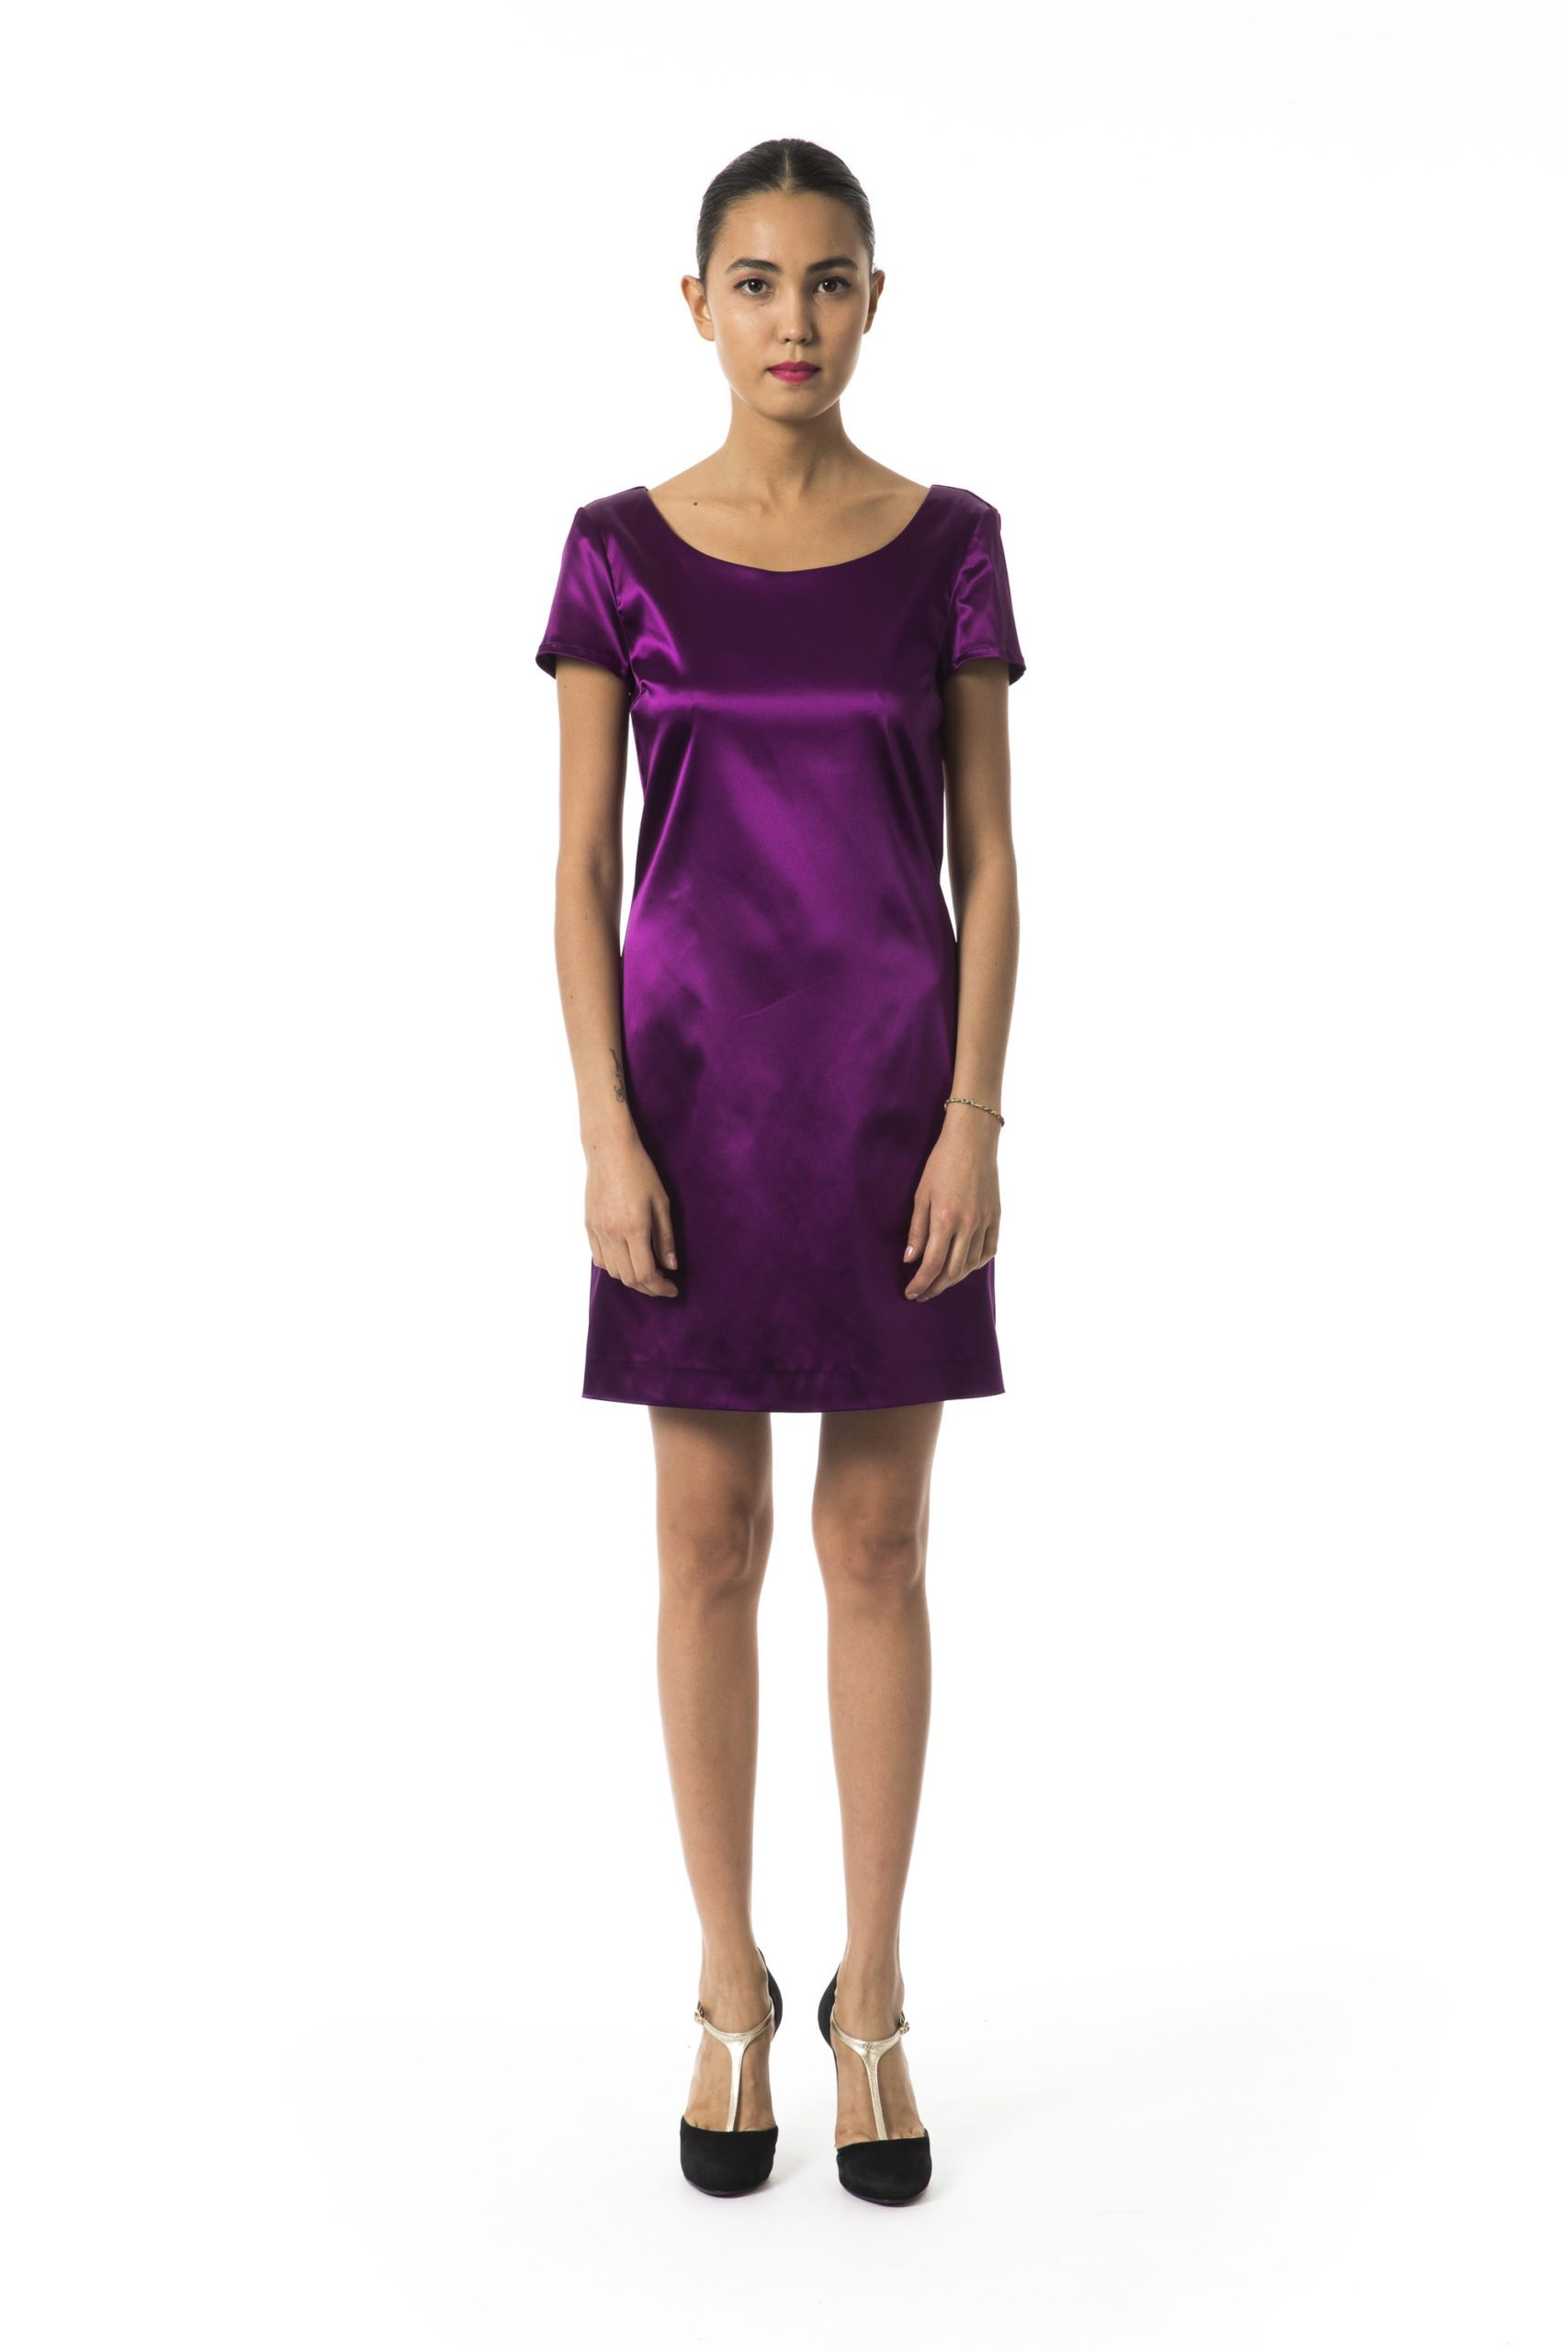 Byblos Women's Magentabis Dress Violet BY994932 - IT40   XS